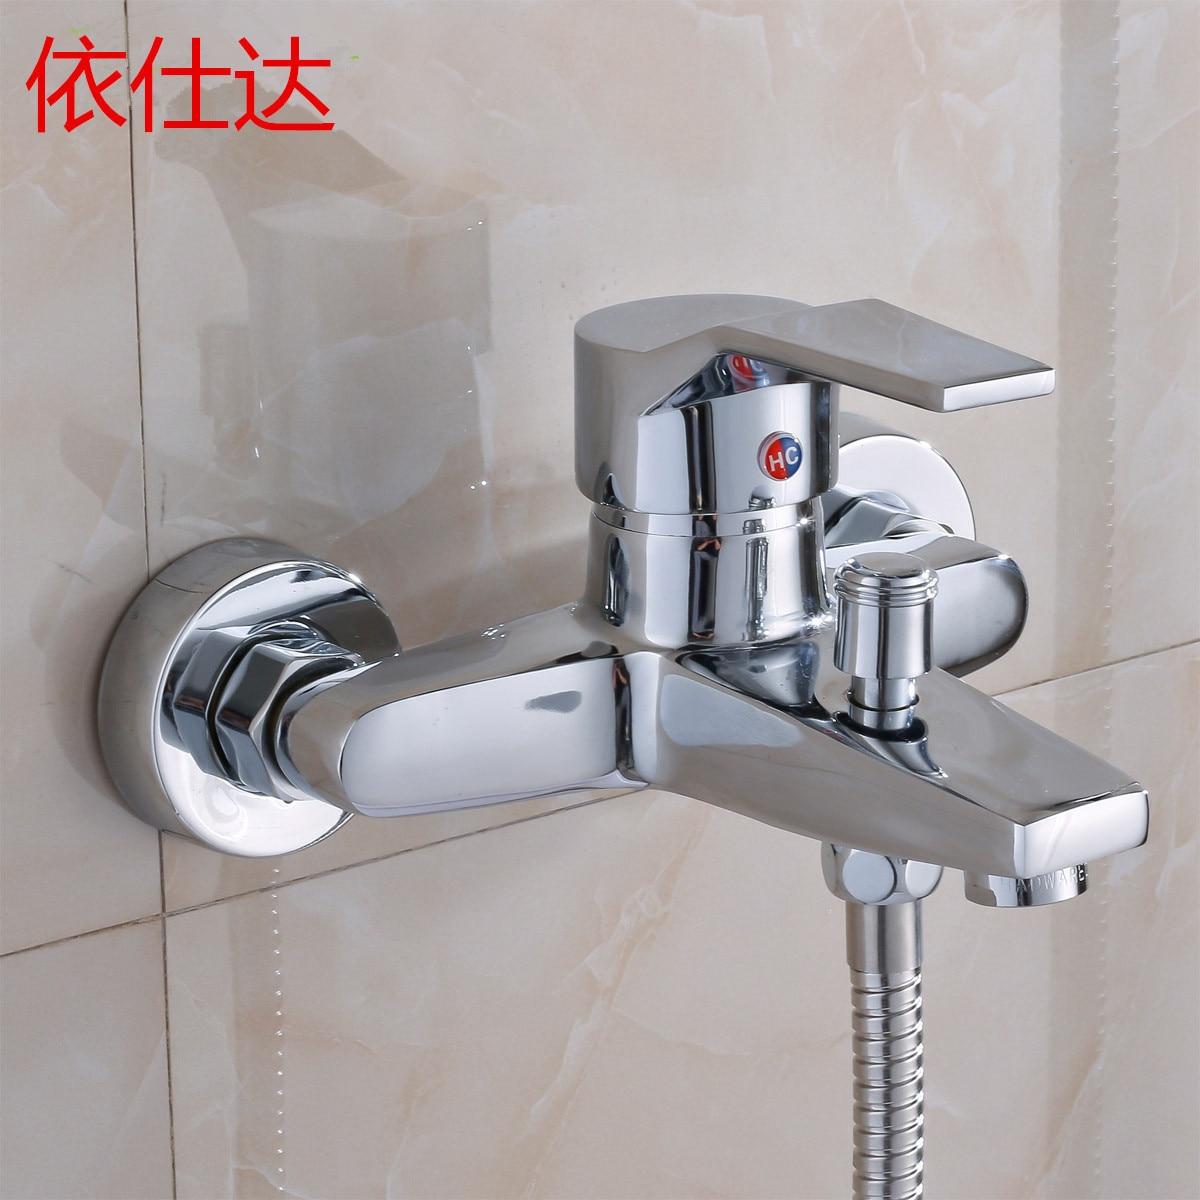 Chrome Thermostatic Bathtub Faucet Freestanding Bath Shower Set Rotate Spout Floor Mounted Tub Mixer Tap Plastic Handshower